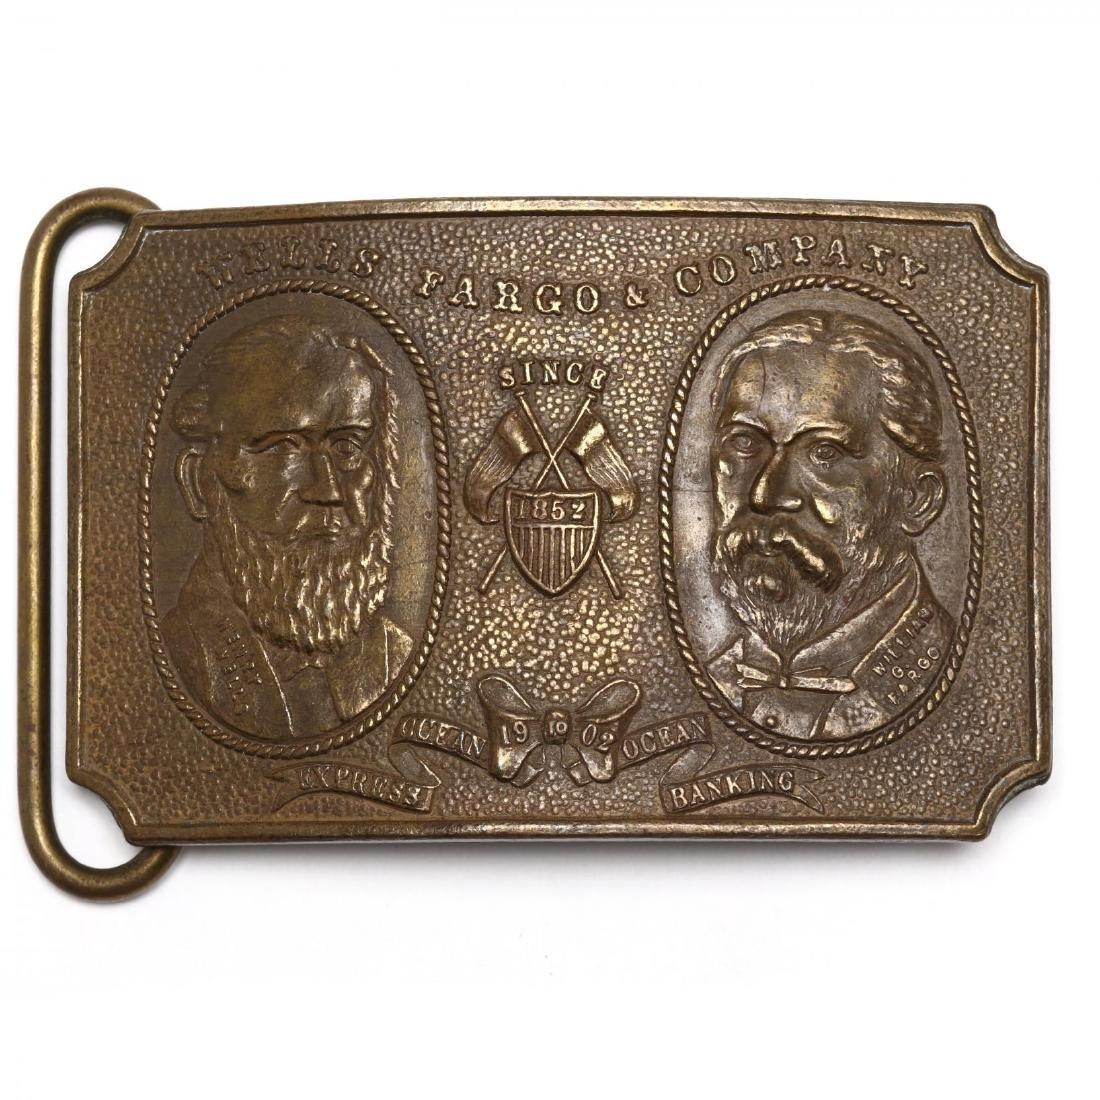 Five Vintage Tiffany Belt Buckles for Wells Fargo & - 4